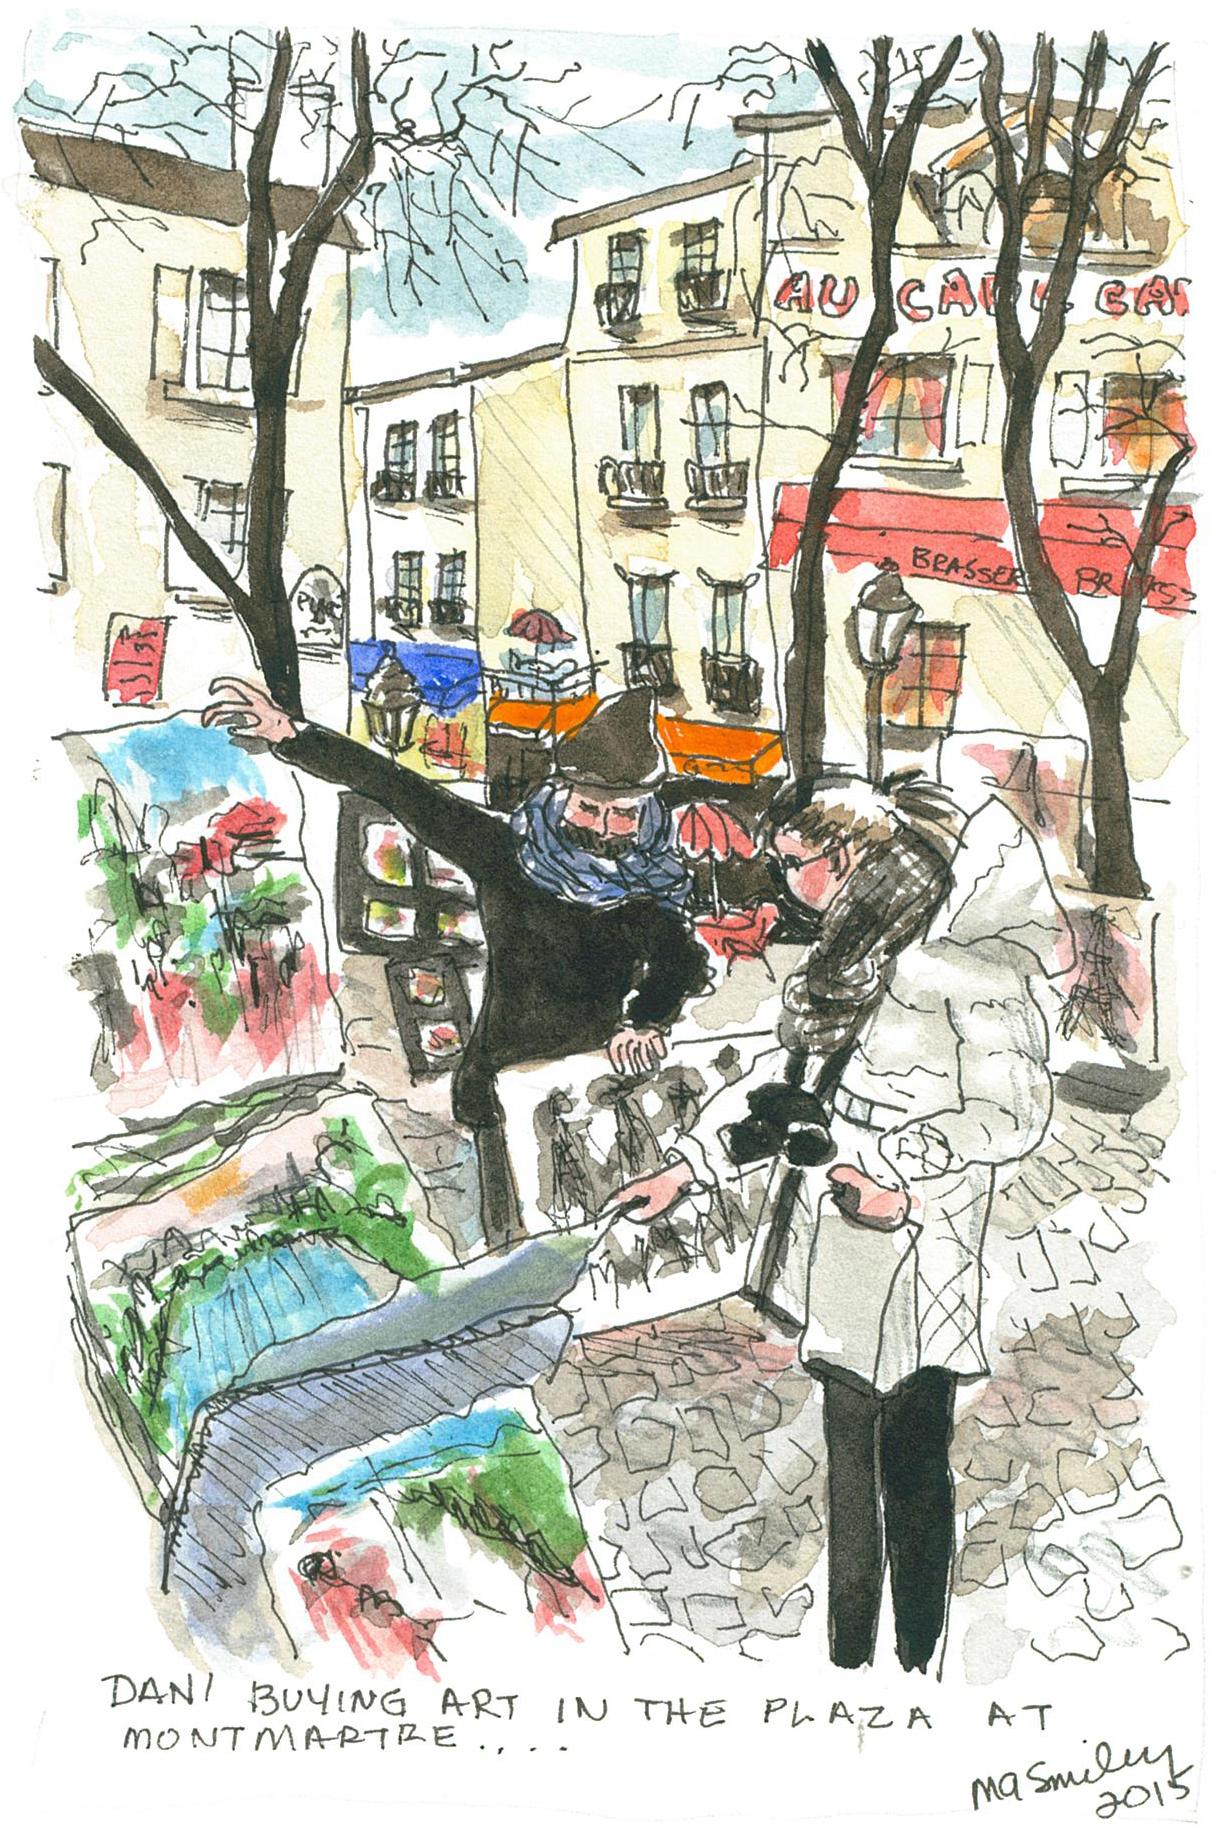 Art at MontMartre